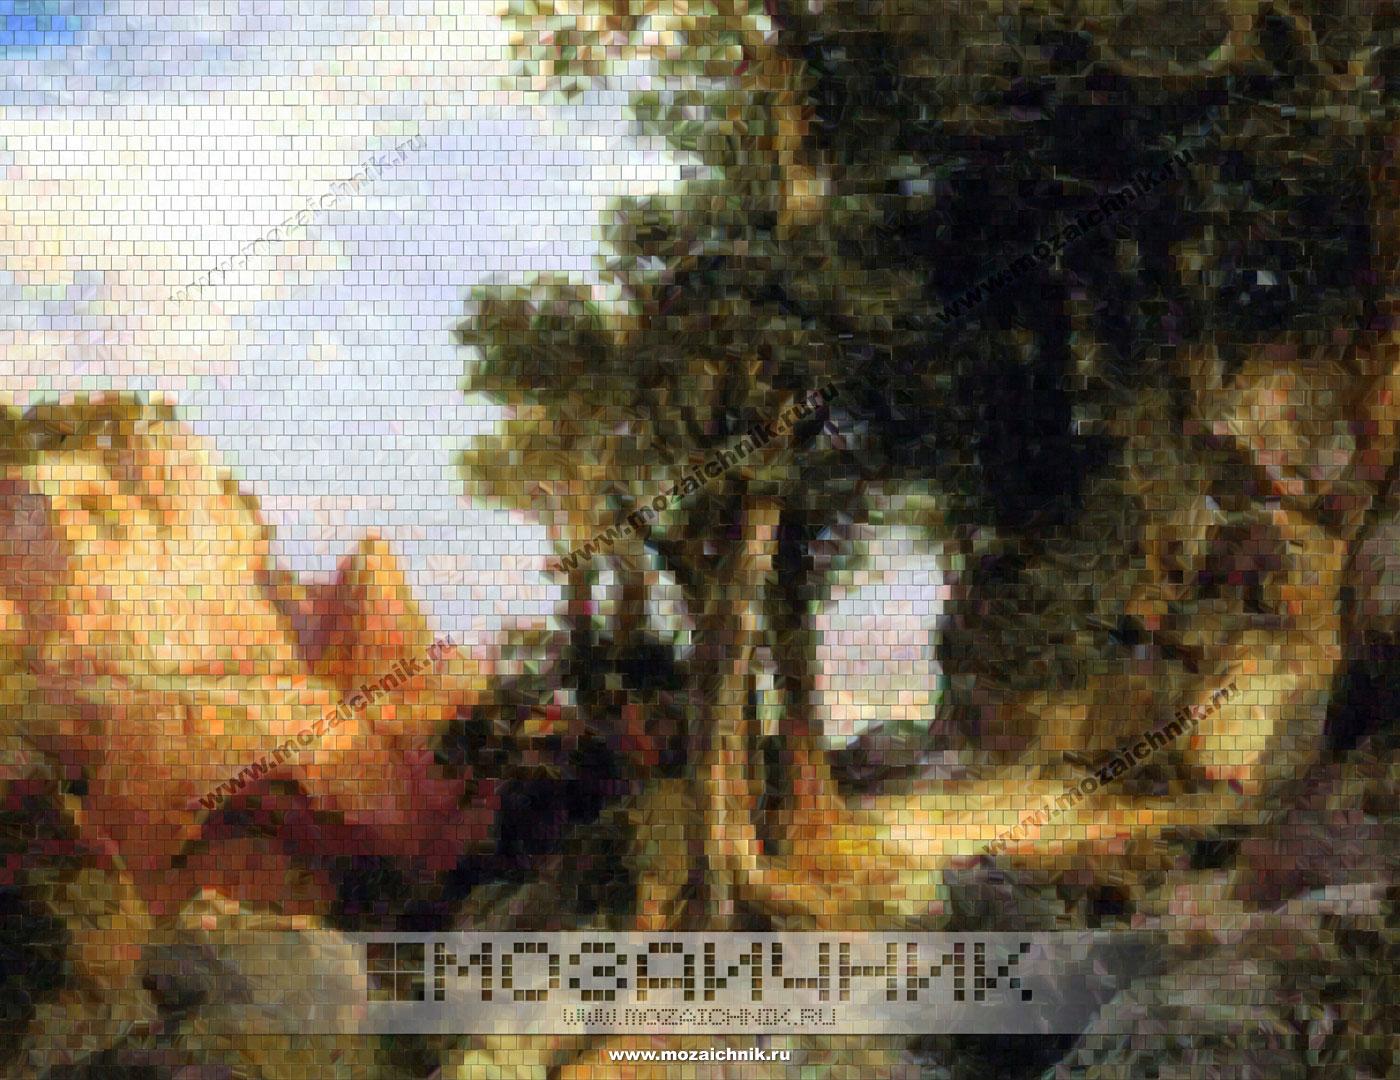 Отделочные материалы: мозаика